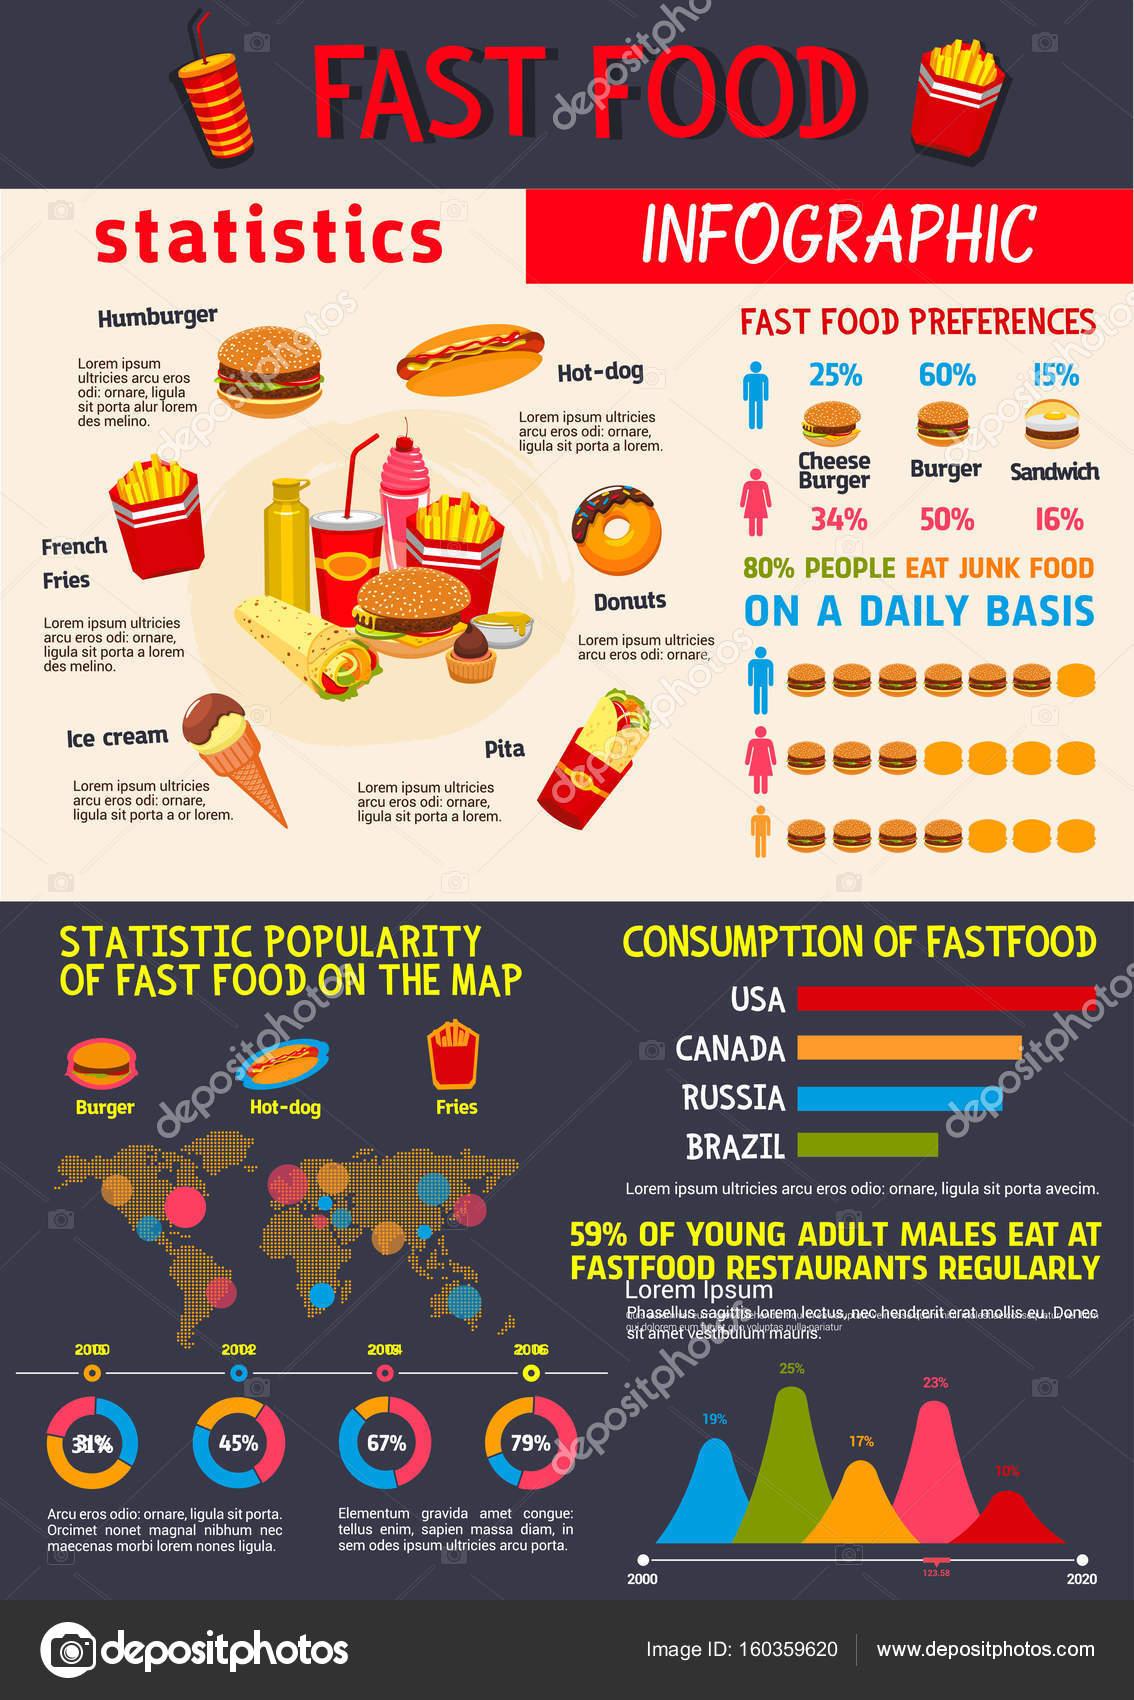 Fast Food Restaurant Waste Statistics